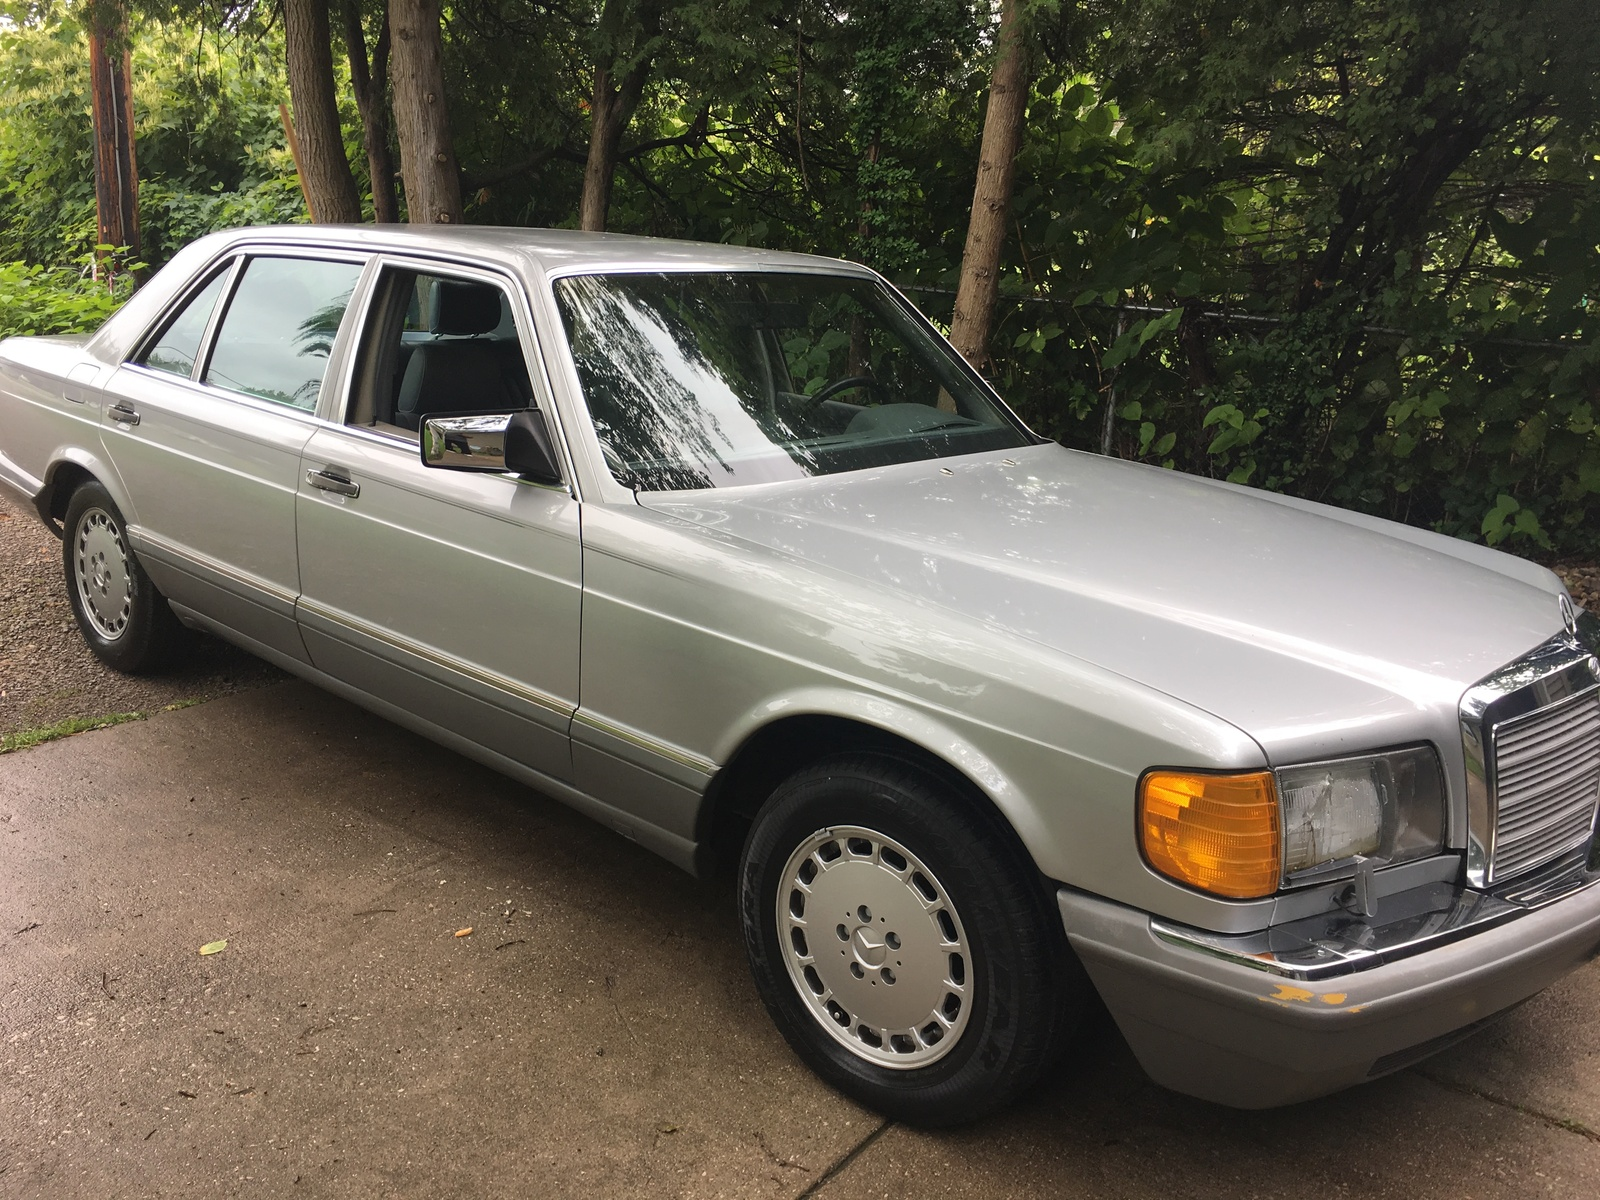 Mercedes Benz 560 Class Questions Can I Use Regular